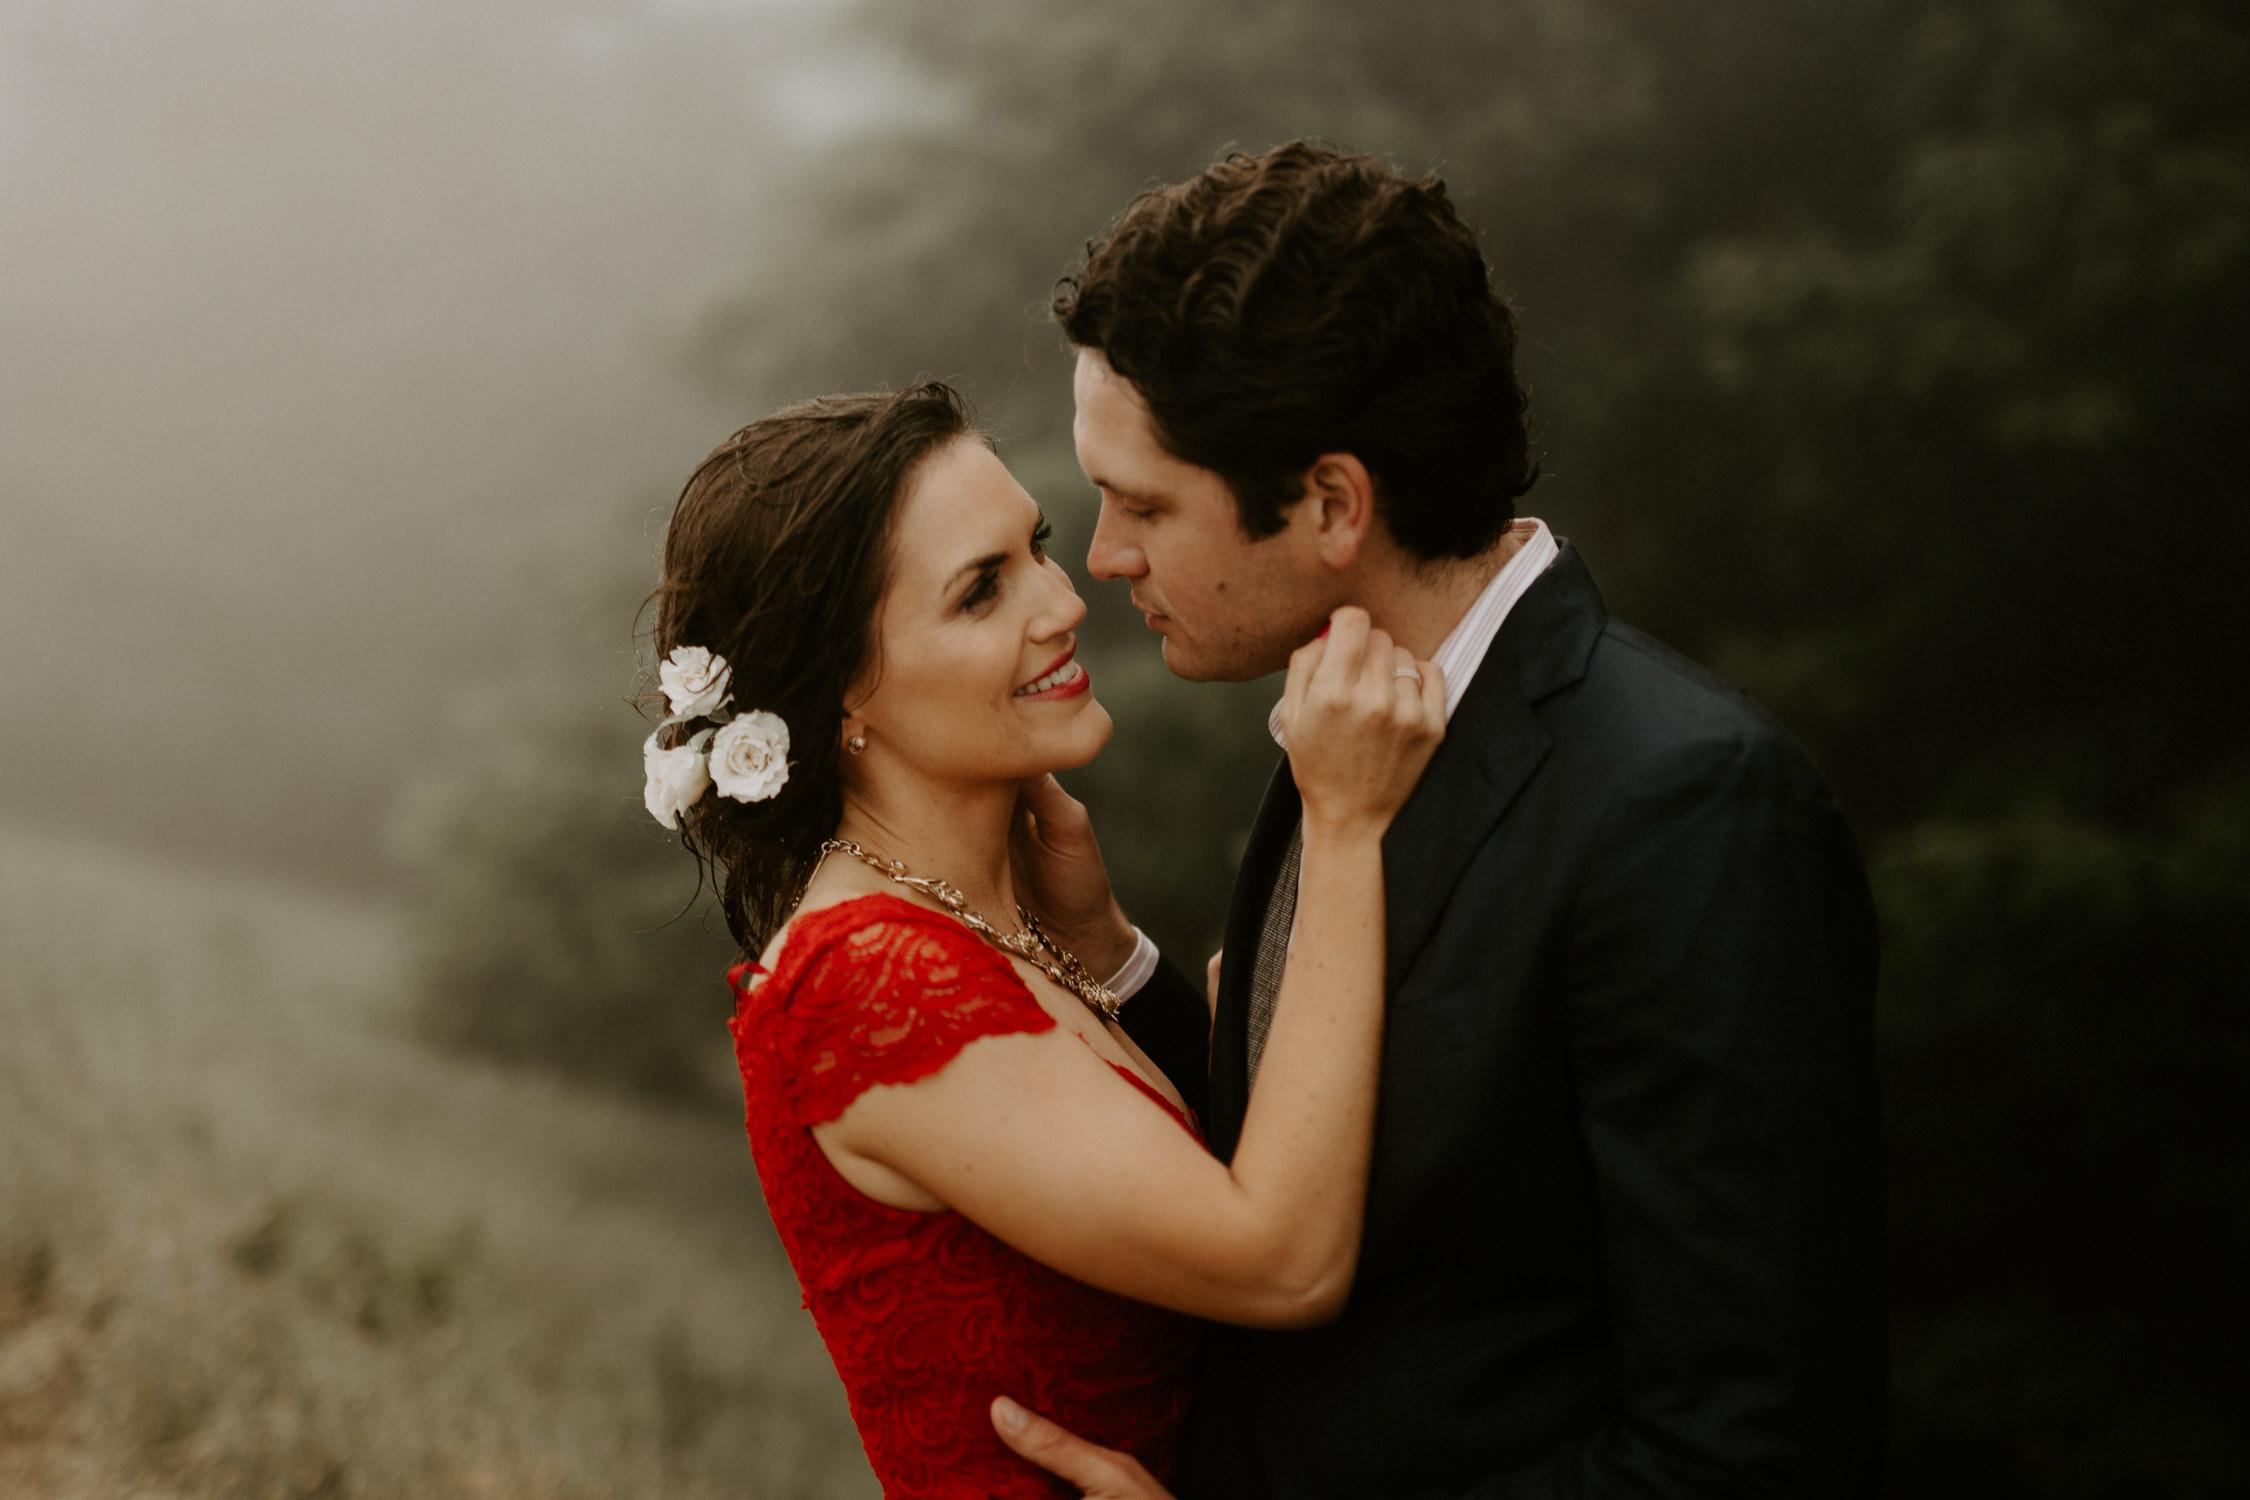 couple-intimate-engagement-session-mt-tam-25.jpg